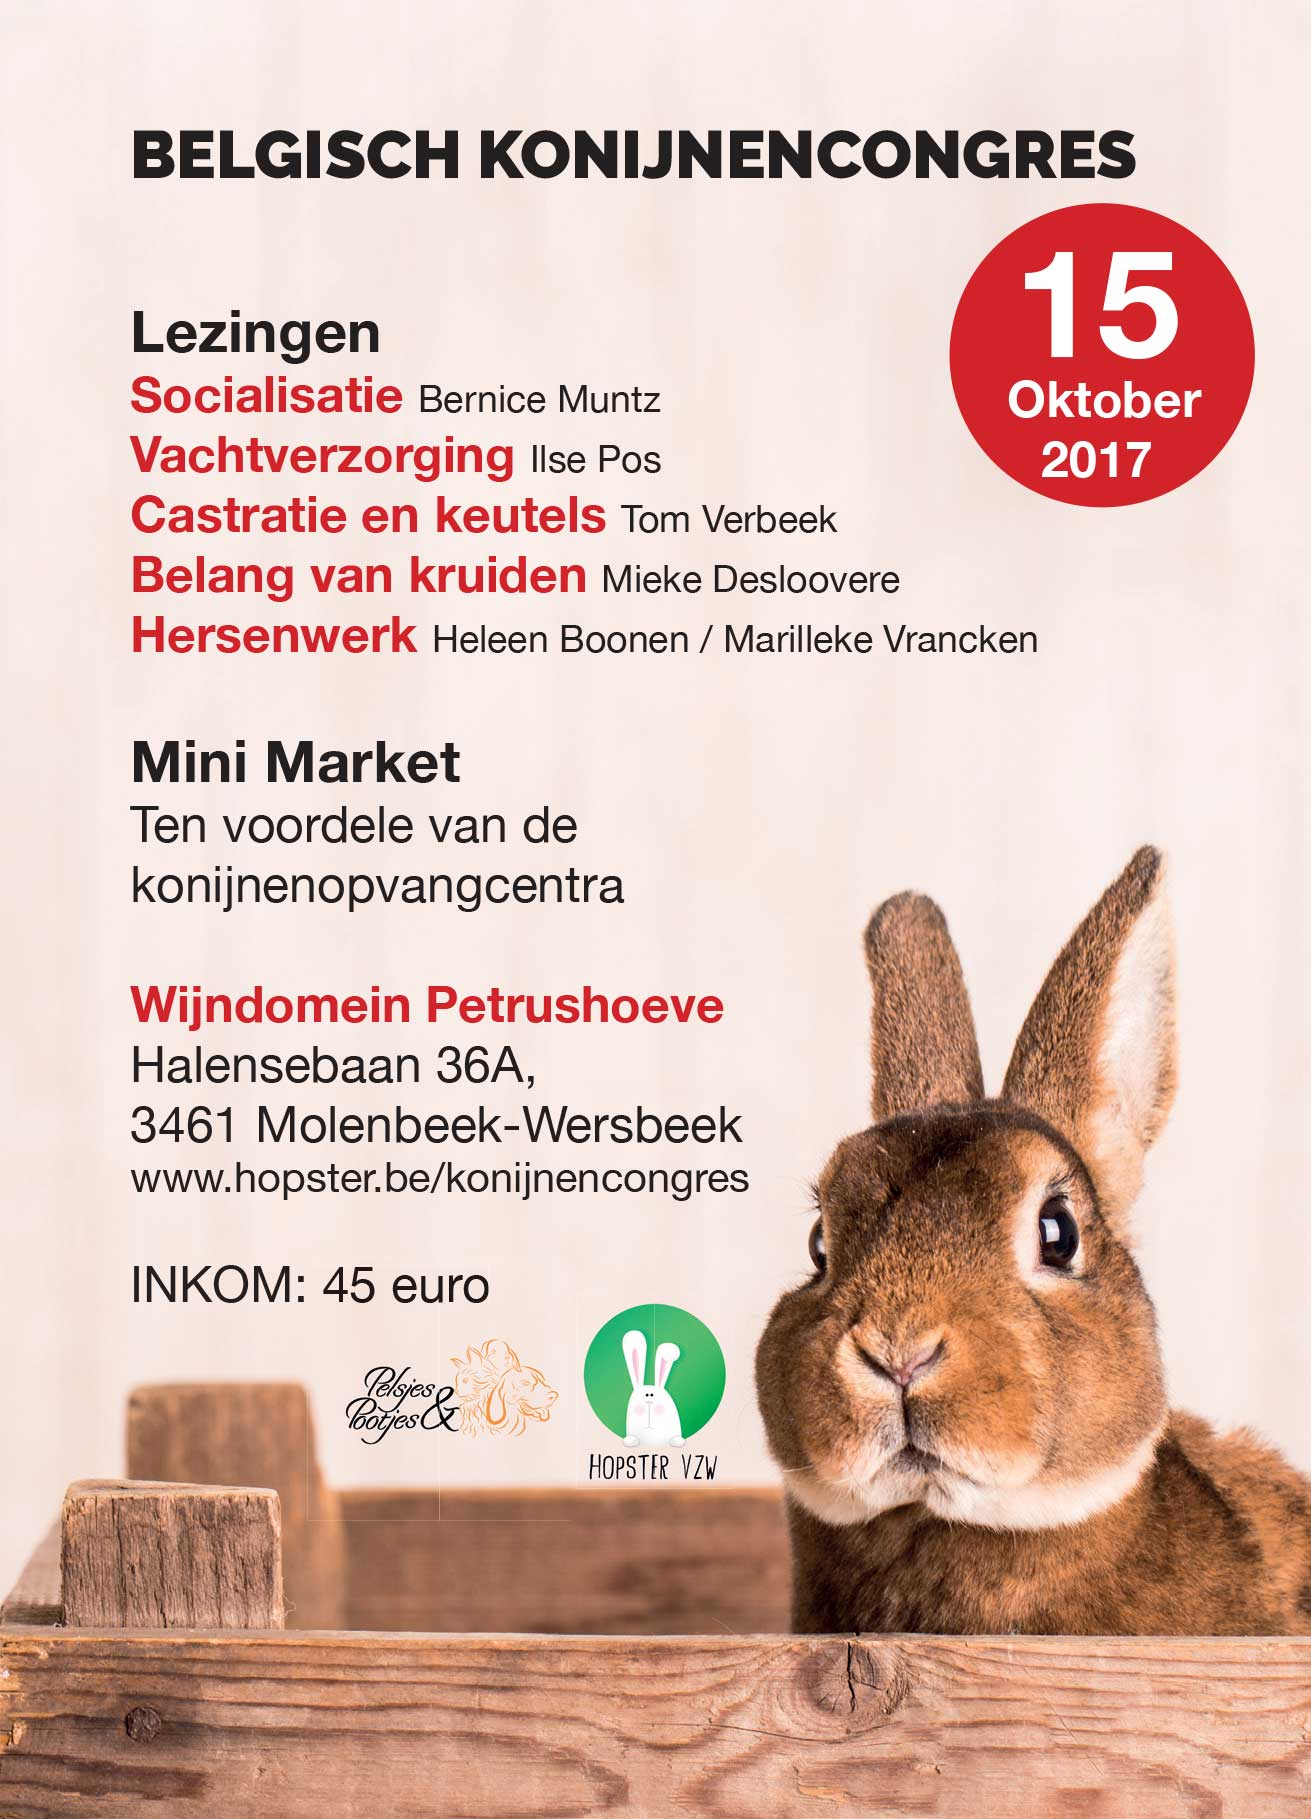 Konijnencongres 2017 | Konijnenadviesbureau Hopster